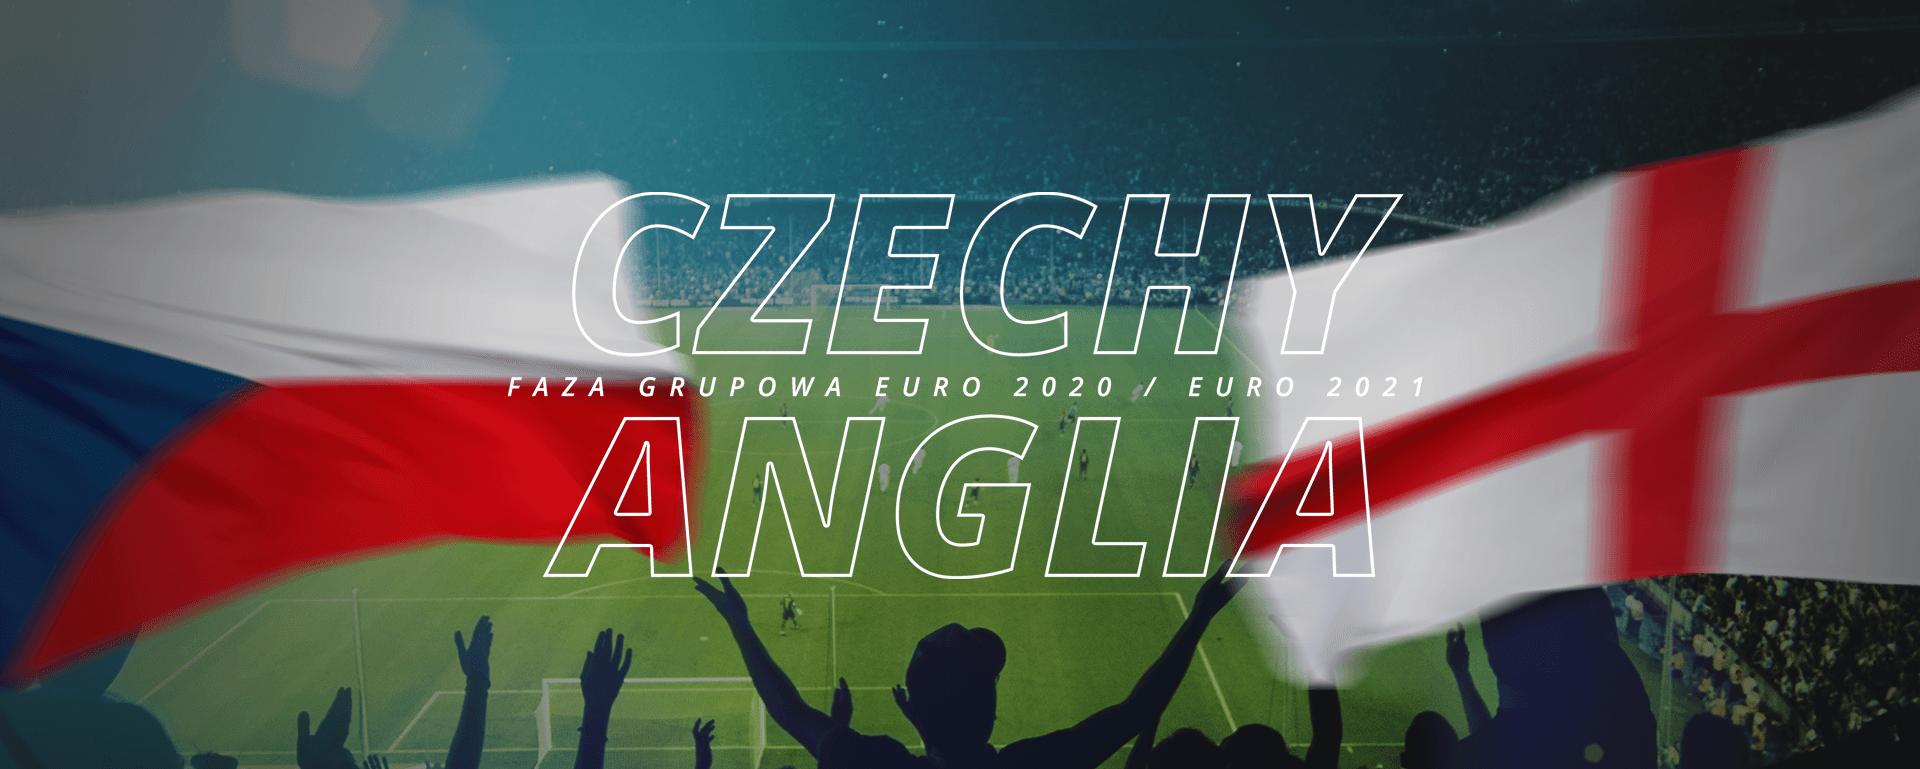 Czechy – Anglia | faza grupowa Euro 2020 / Euro 2021